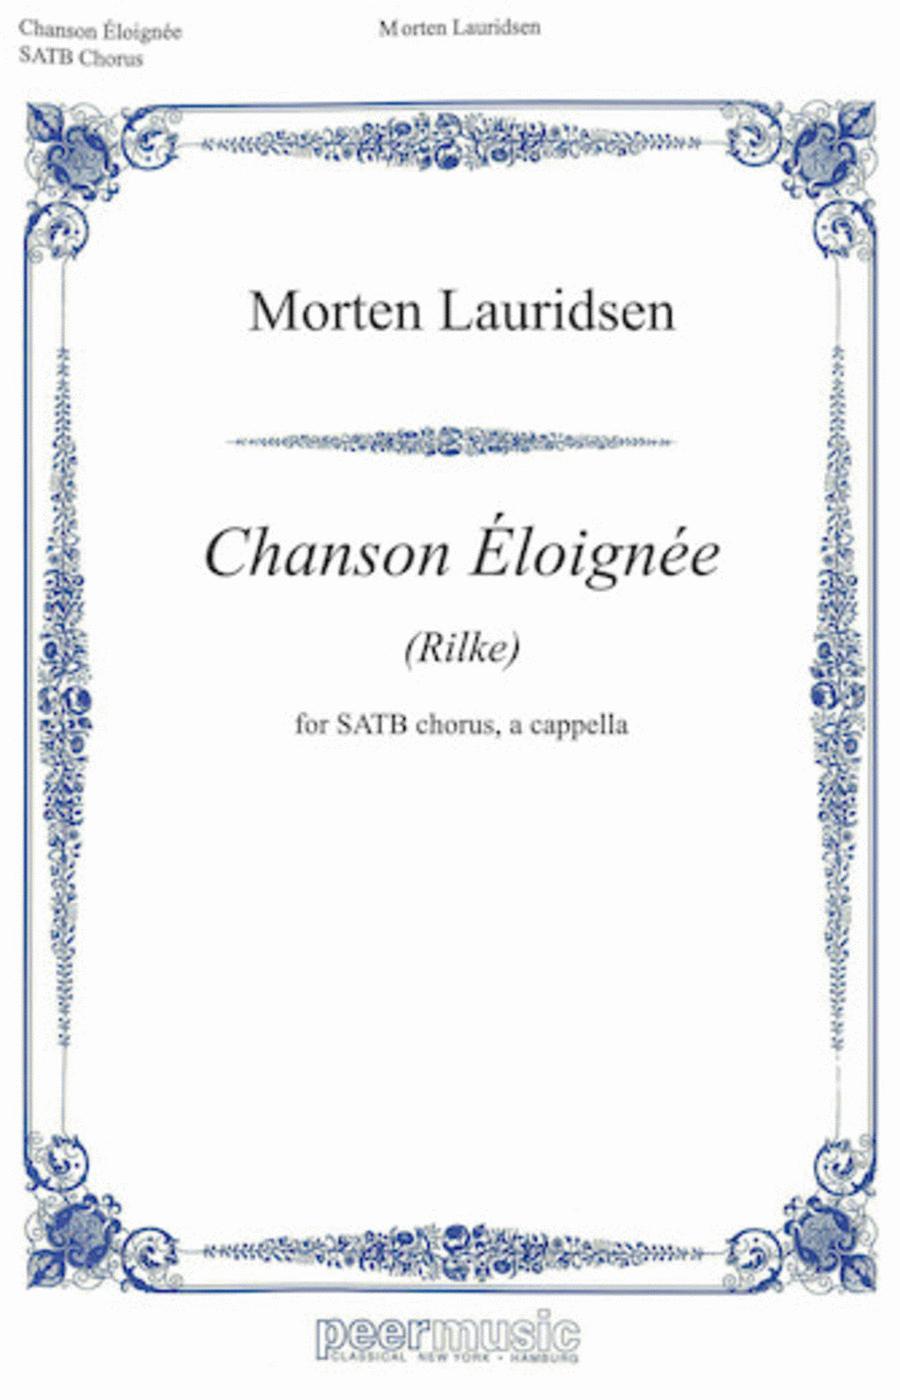 Chanson Eloignee